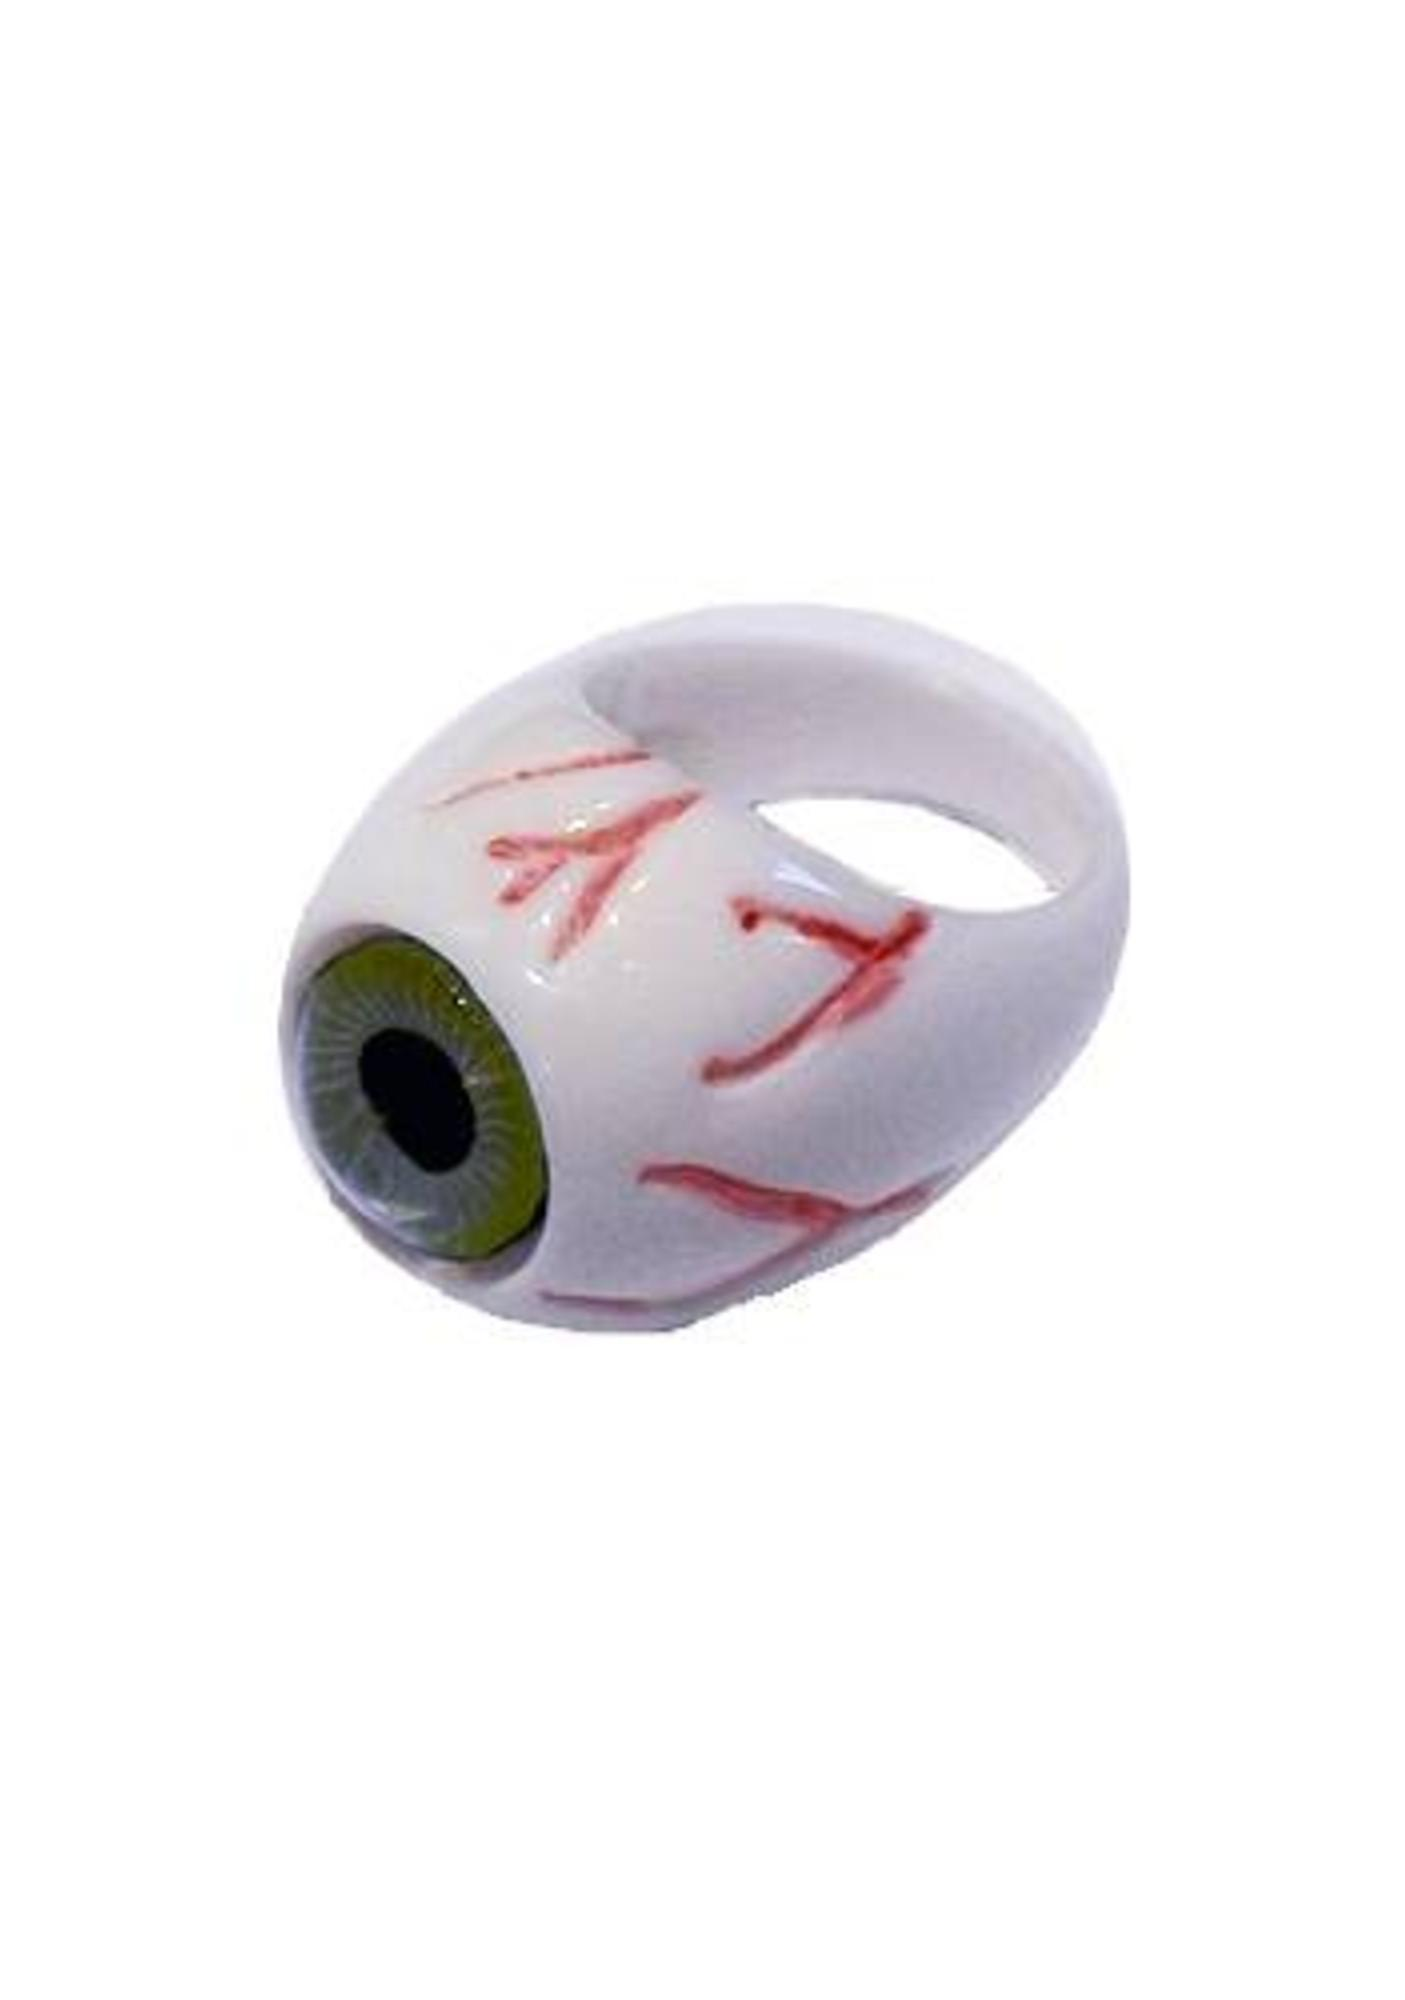 Kreepsville 666 Eyeball Ring